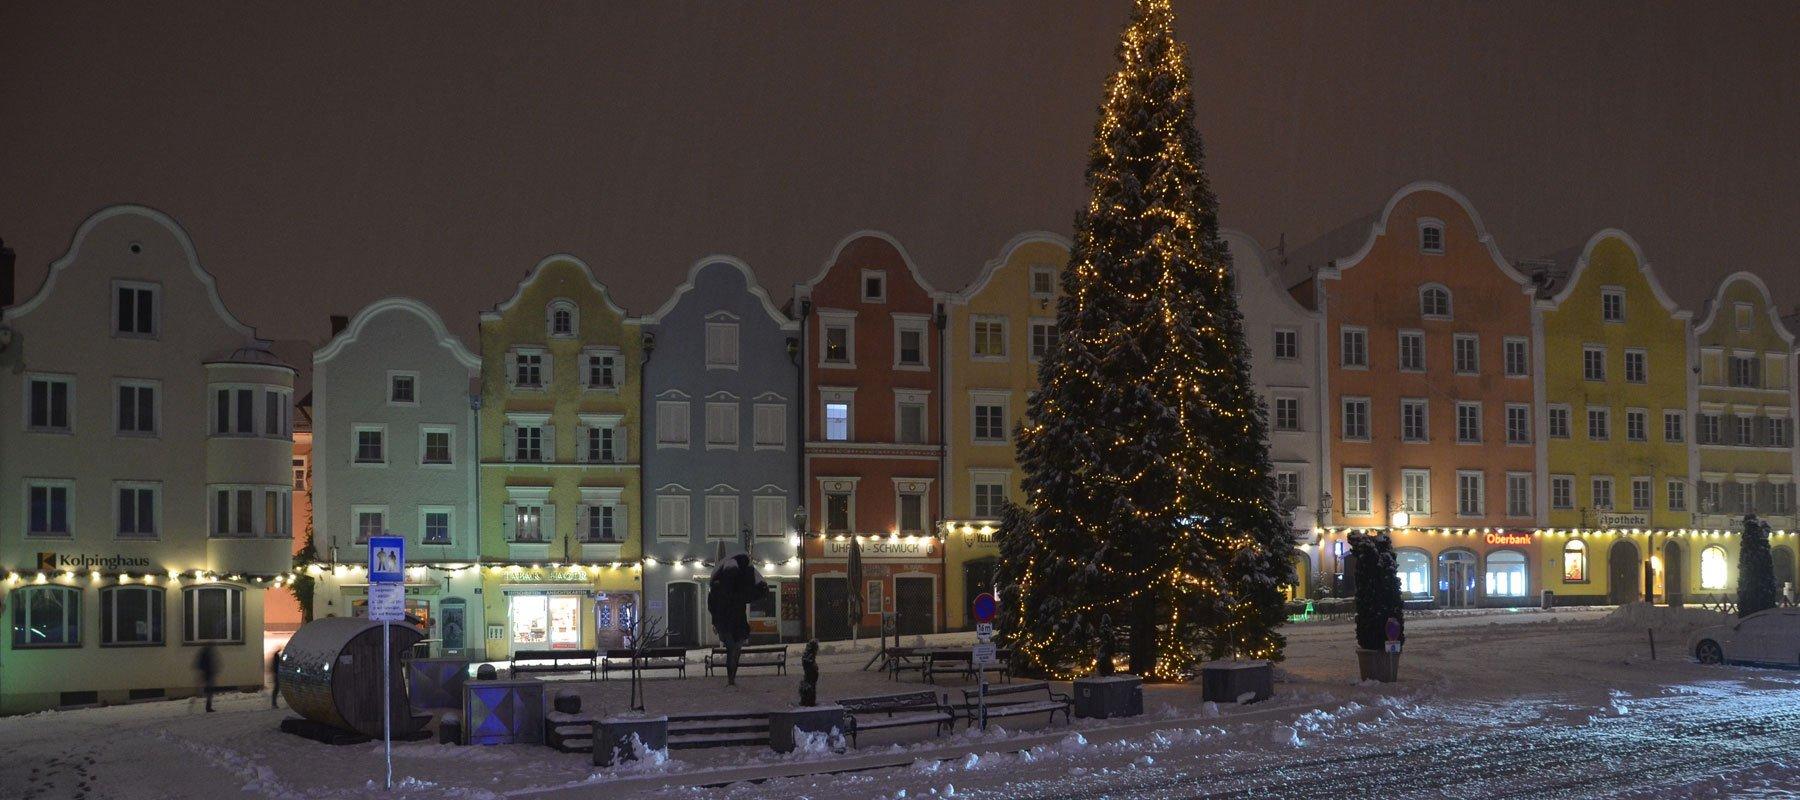 Stadtplatz Schärding im Winter